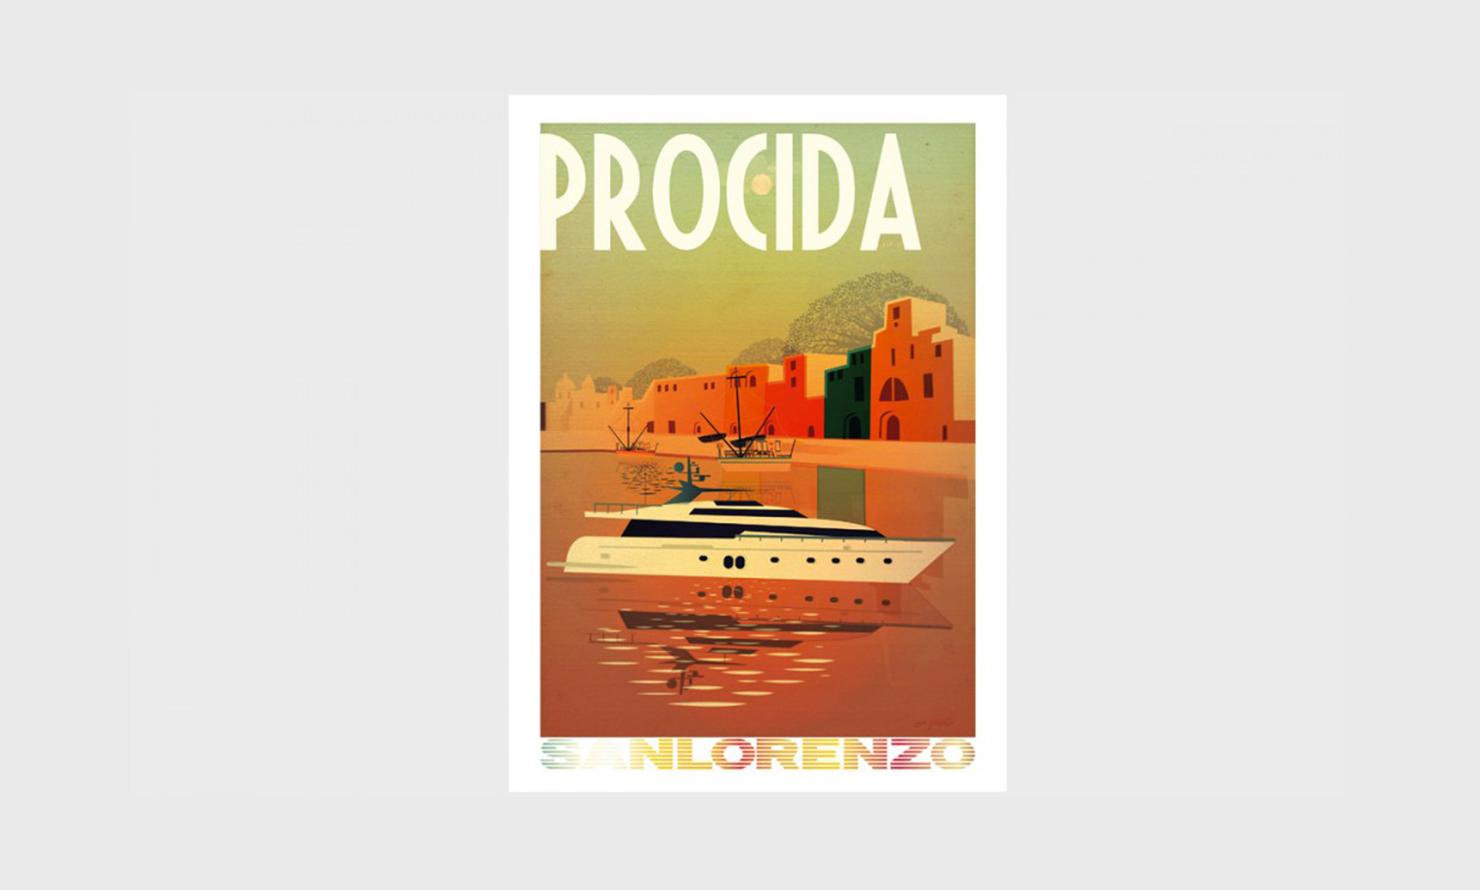 https://kubelibre.com/uploads/Slider-work-tutti-clienti/sanlorenzo-yacht-made-to-measure-yacht-since-1958-poster-3.jpg